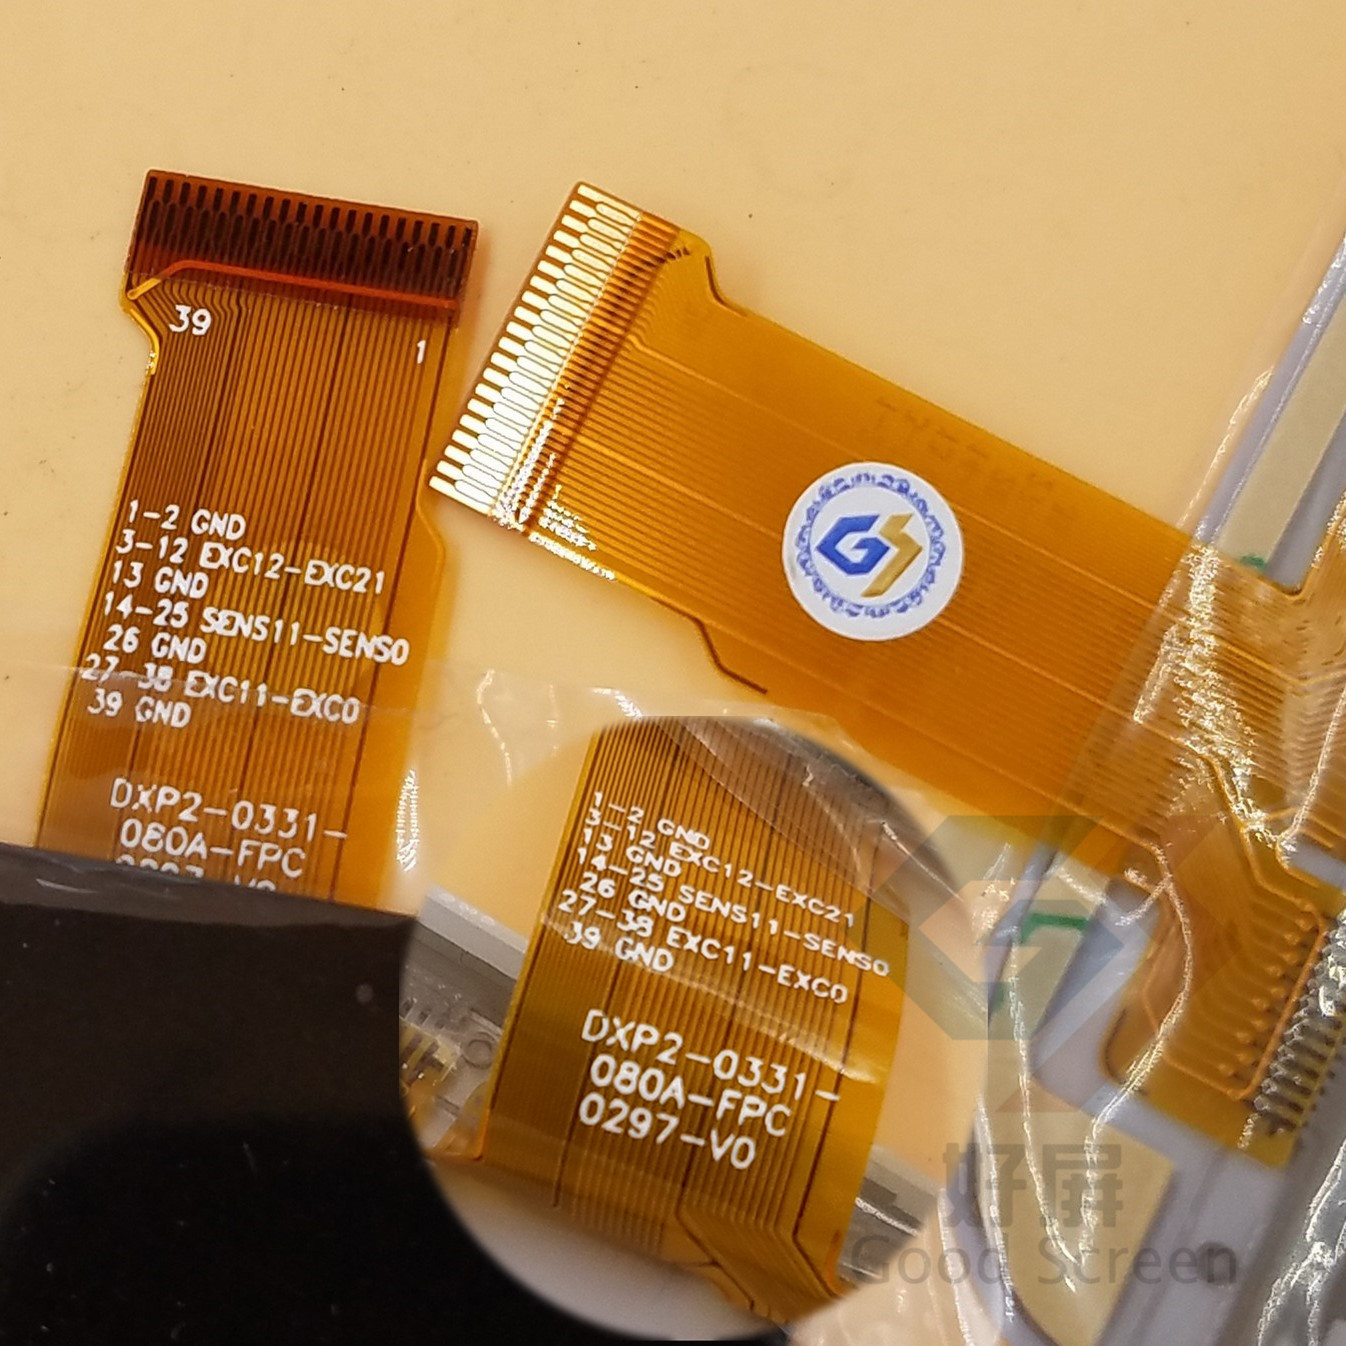 Original New 8inch DXP2-0331-080A-FPC Touch Screen Digitizer Sensor Tablet Panel Repairment DXP2-0331 Oysters T84ERI 3G